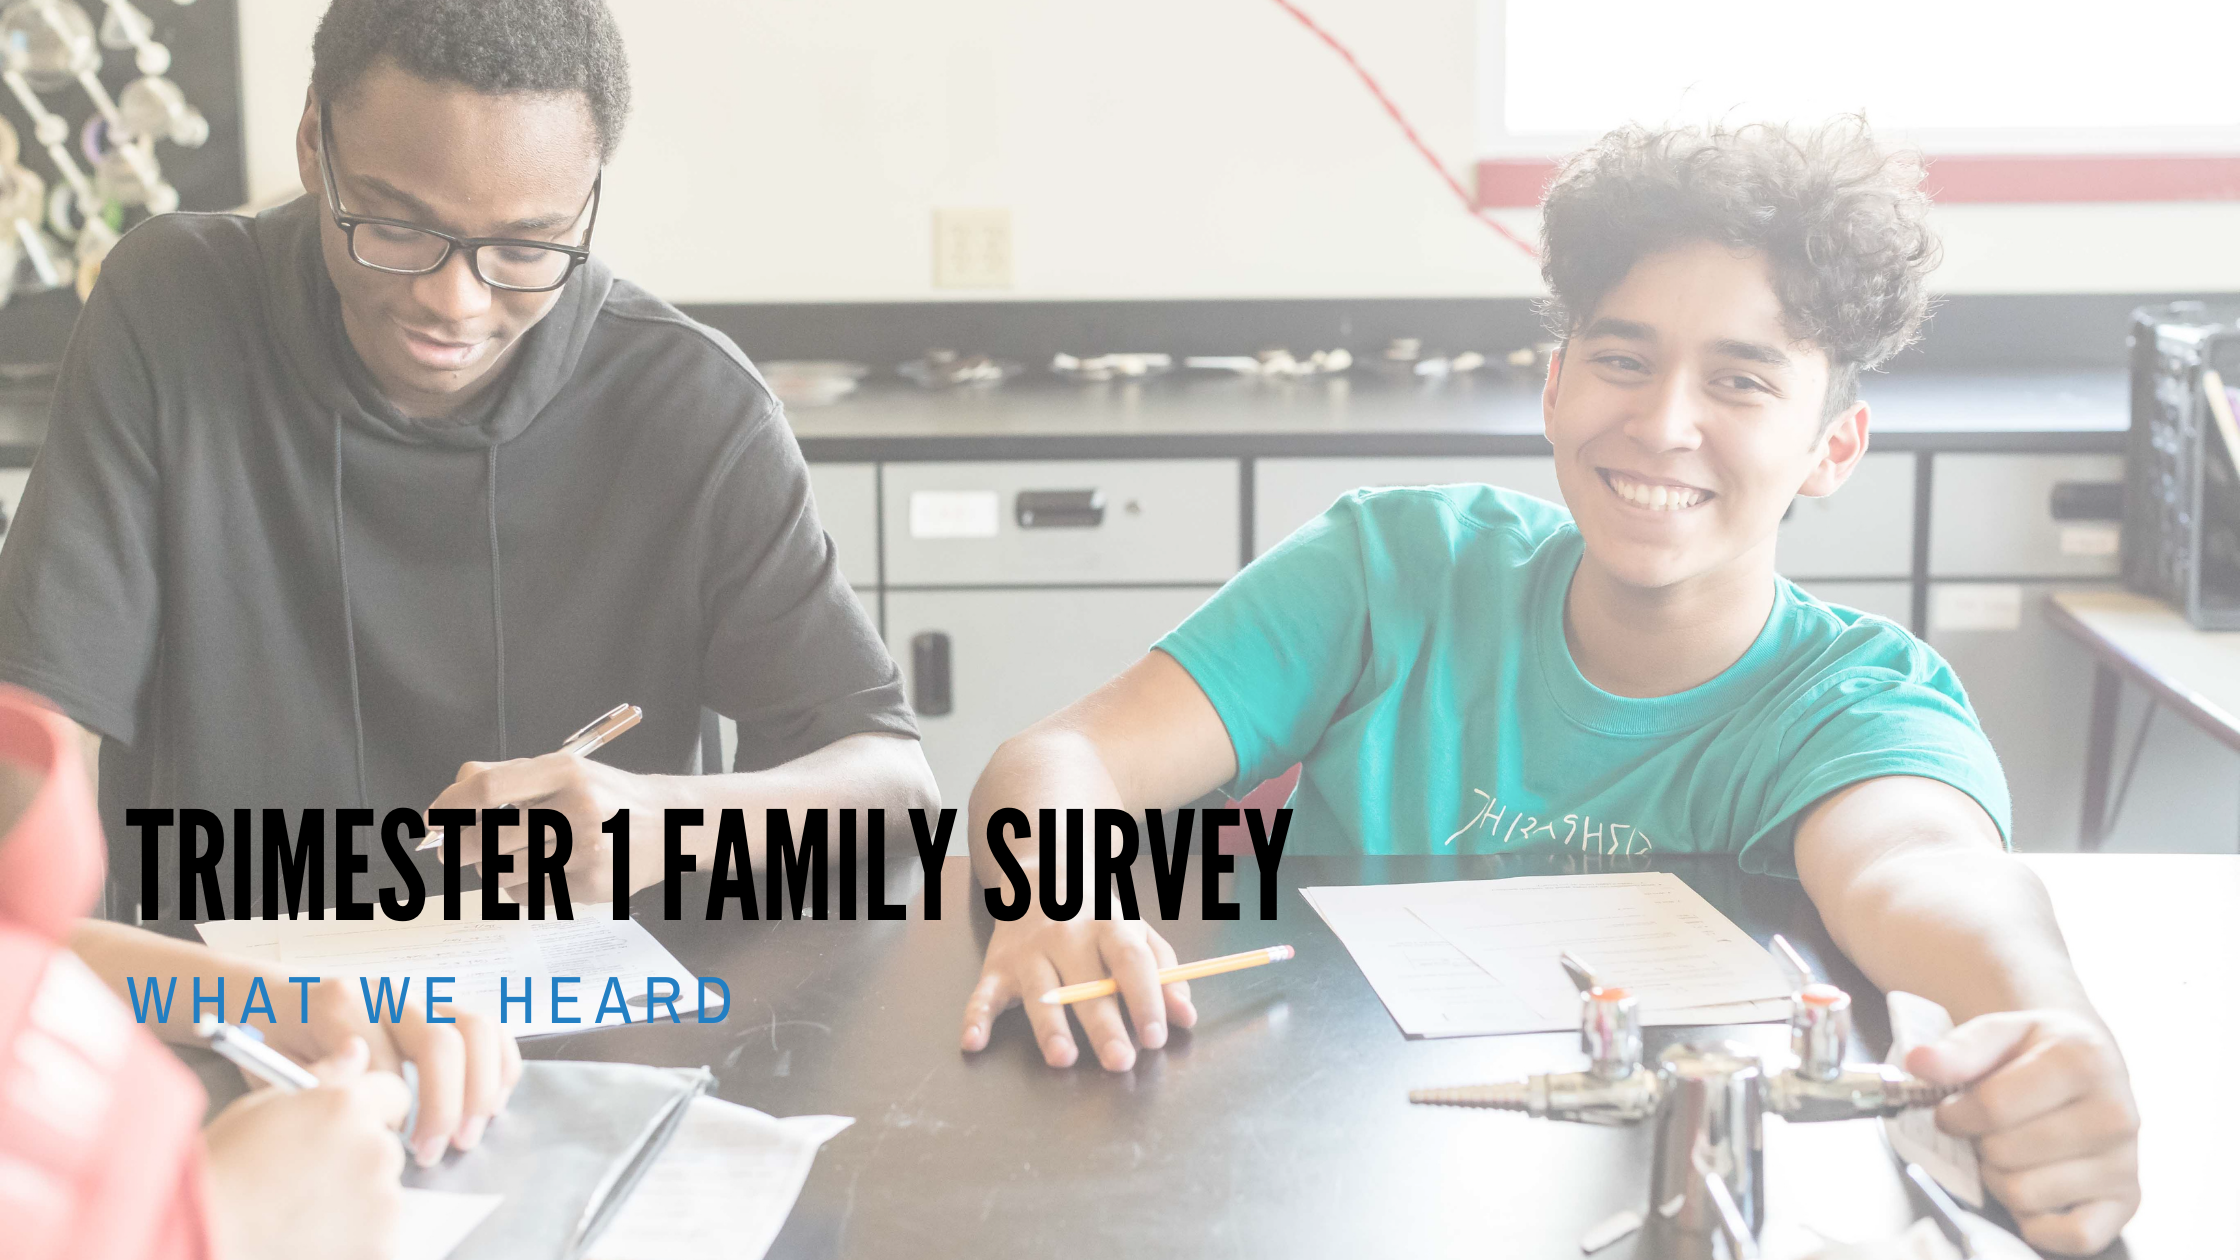 Trimester 1 Family Survey